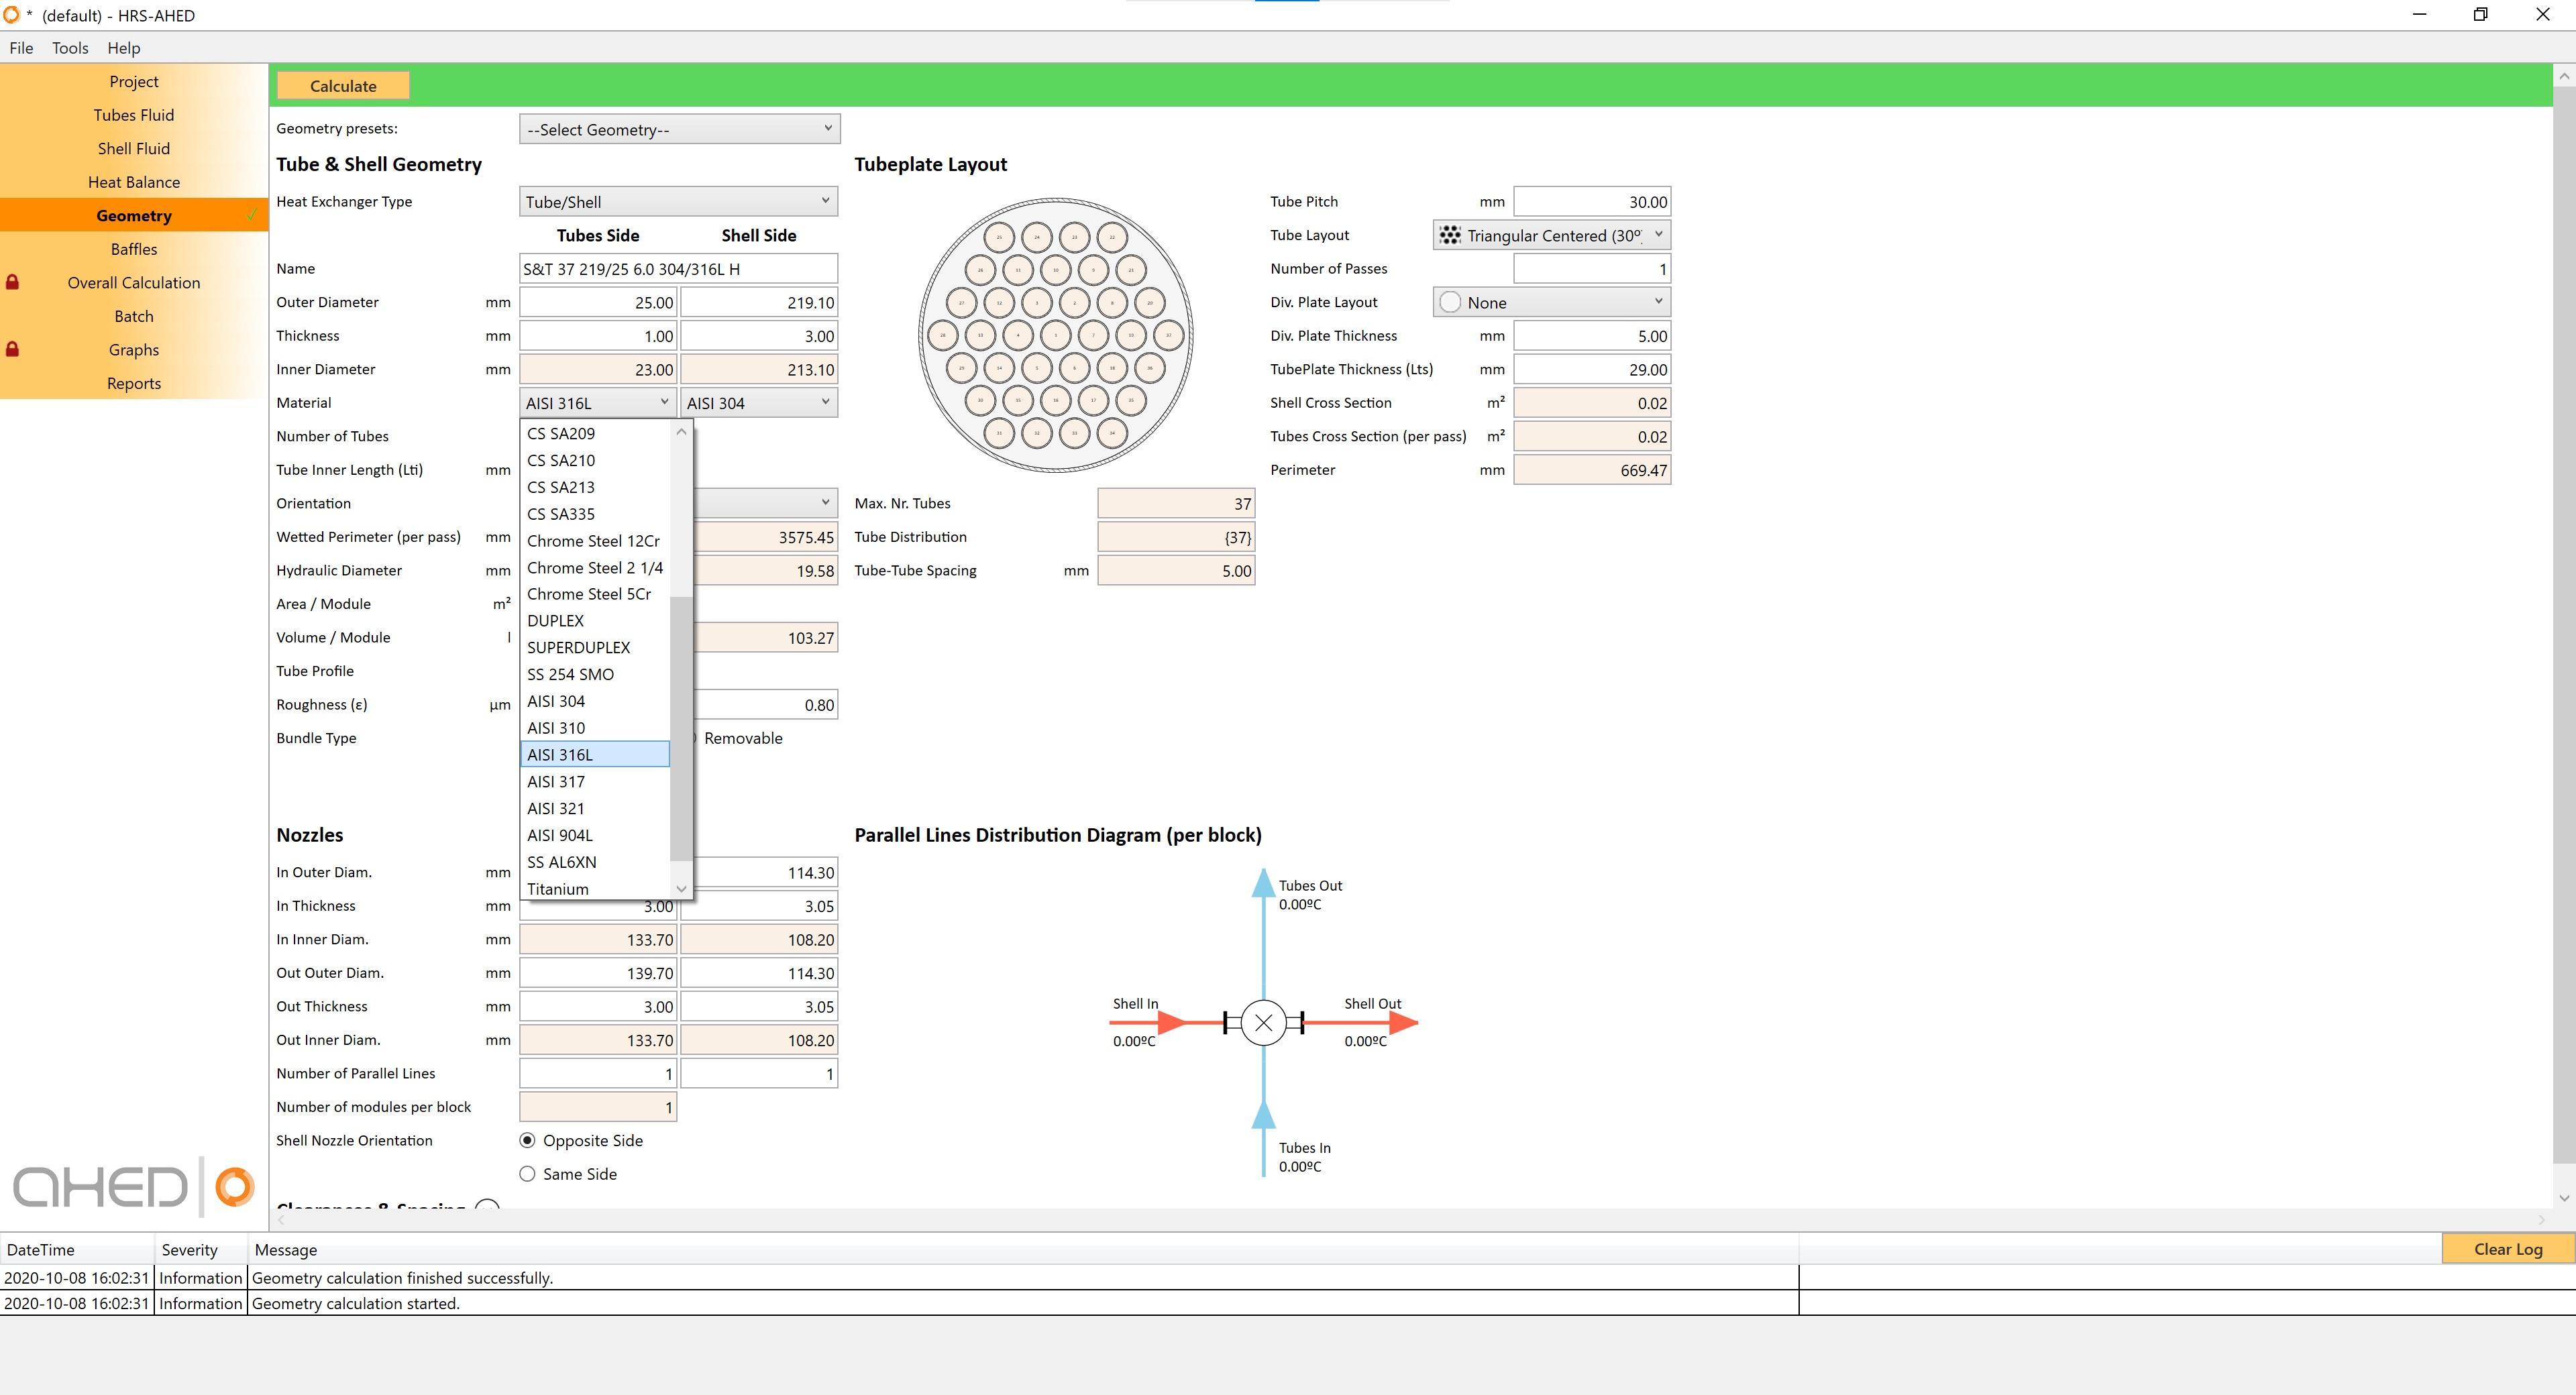 Software de intercambiadores de calor: expande las posibilidades de colaboración